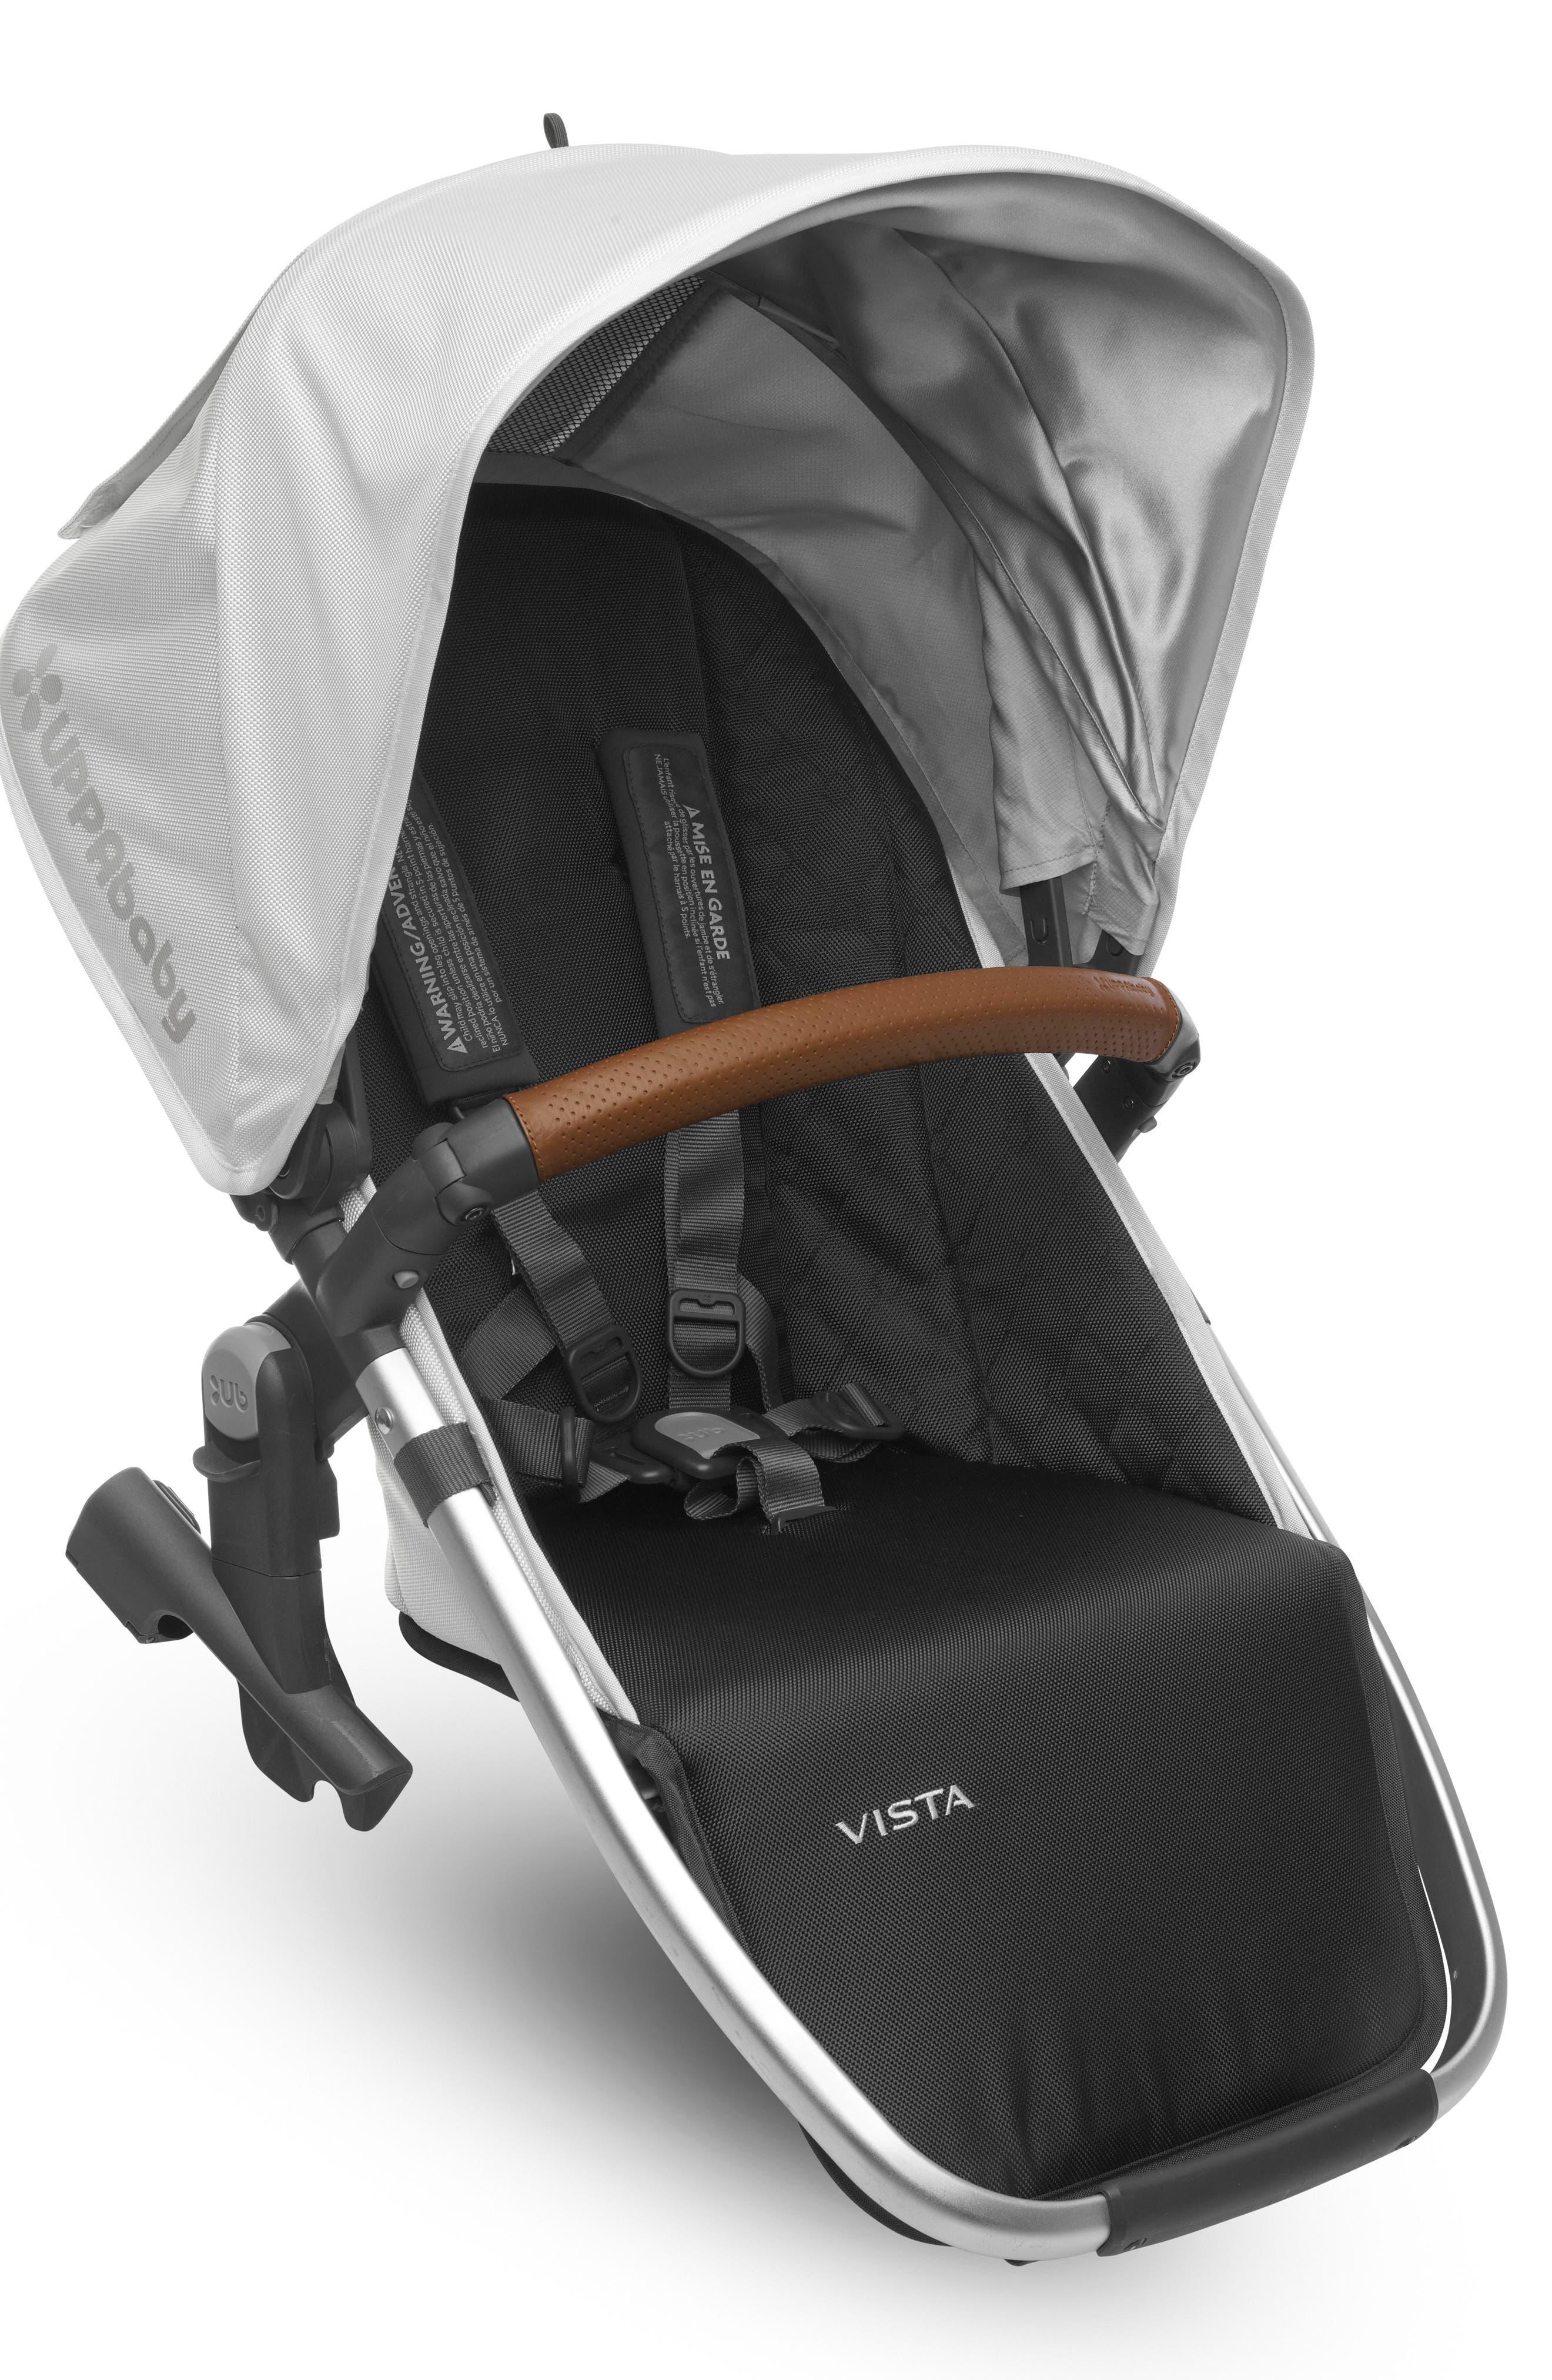 VISTA Stroller Rumble Seat,                         Main,                         color, 110